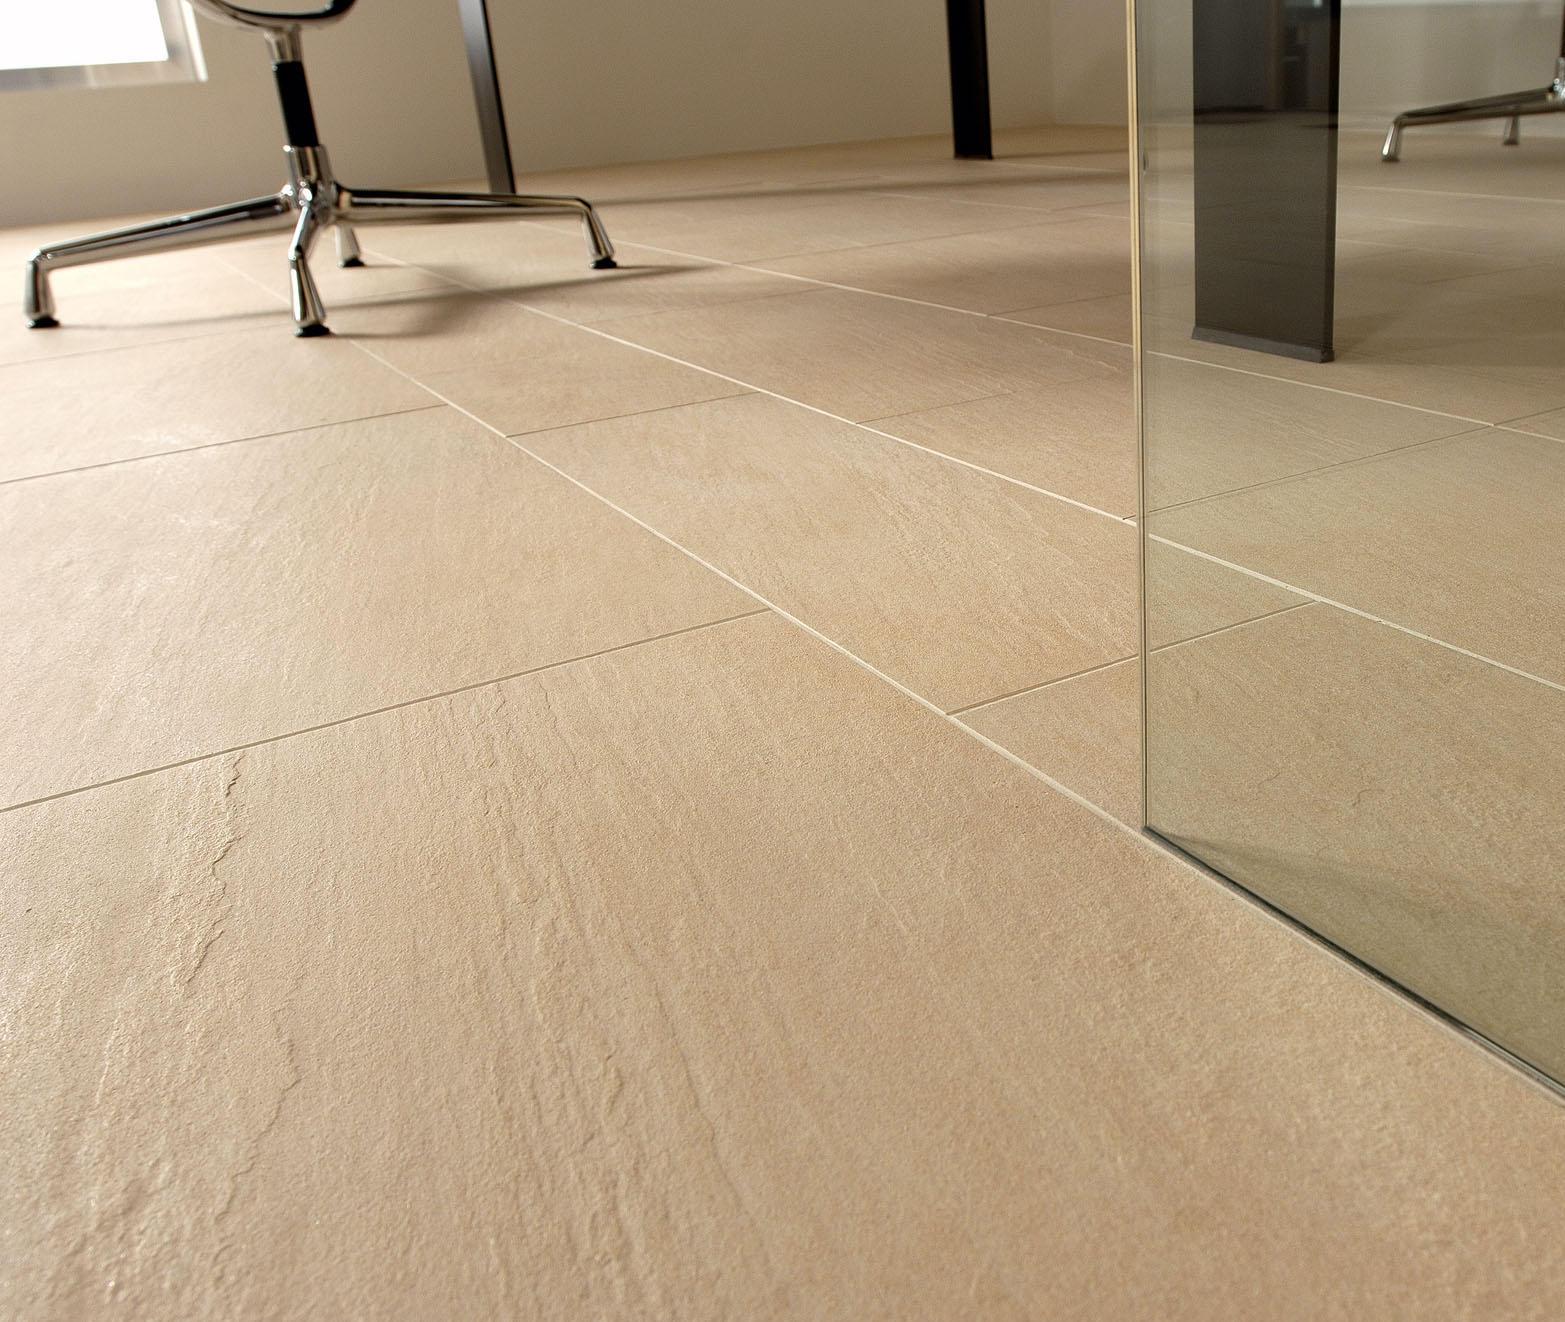 Lapitec Costo Al Mq q2 tea quartz & mobili designer | architonic